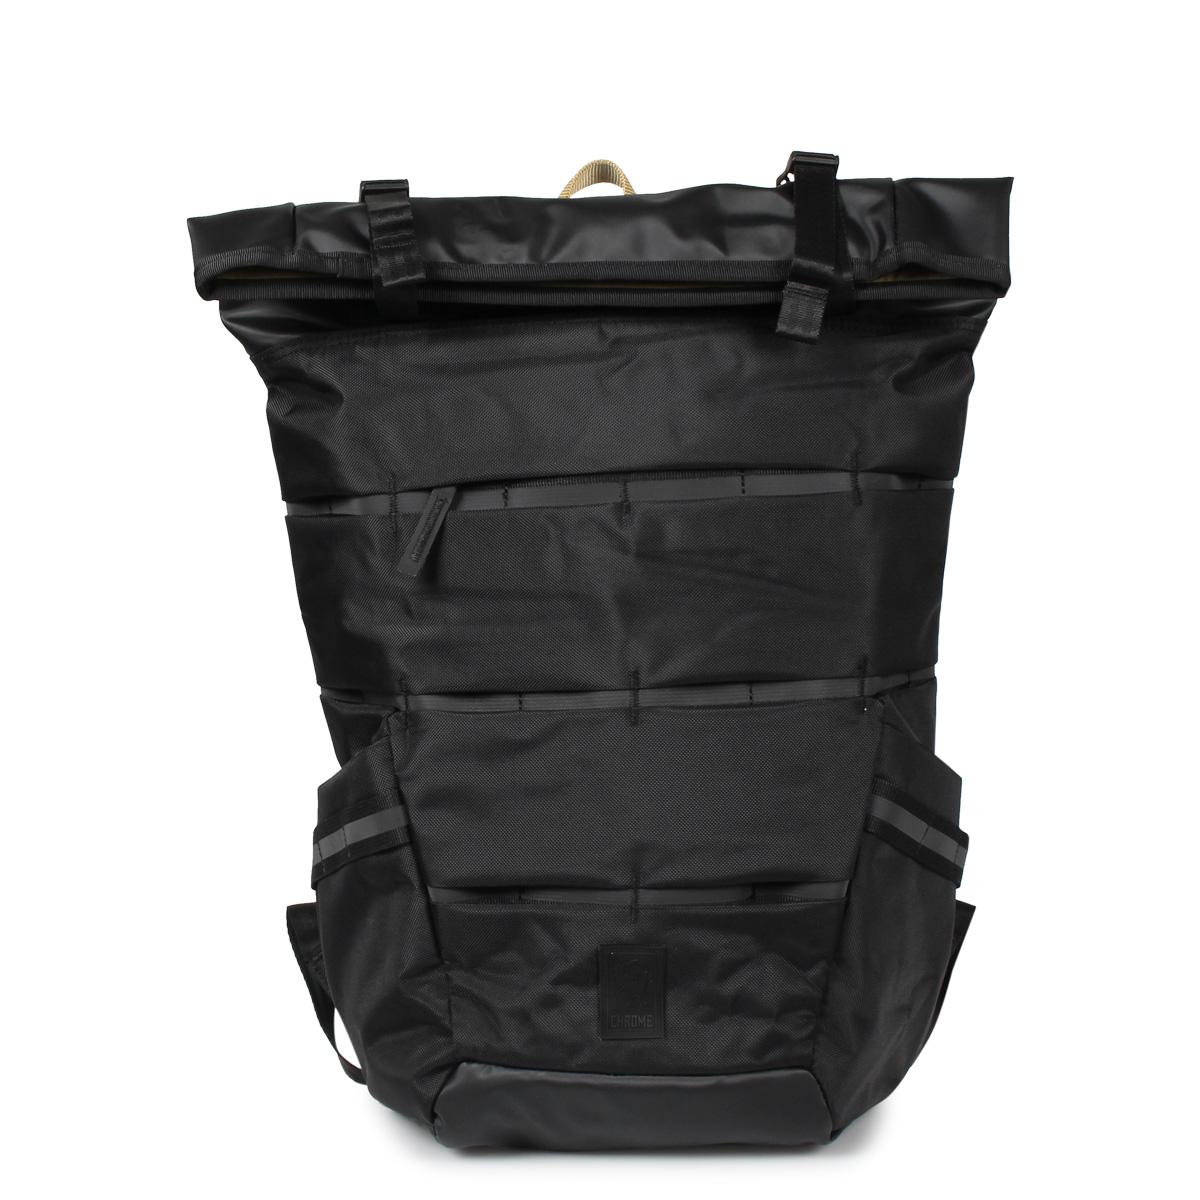 CHROME MAZER ENSIGN ROLLTOP PACK クローム リュック バッグ バックパック エンジン ロールトップ メンズ レディース ブラック 黒 BG-279